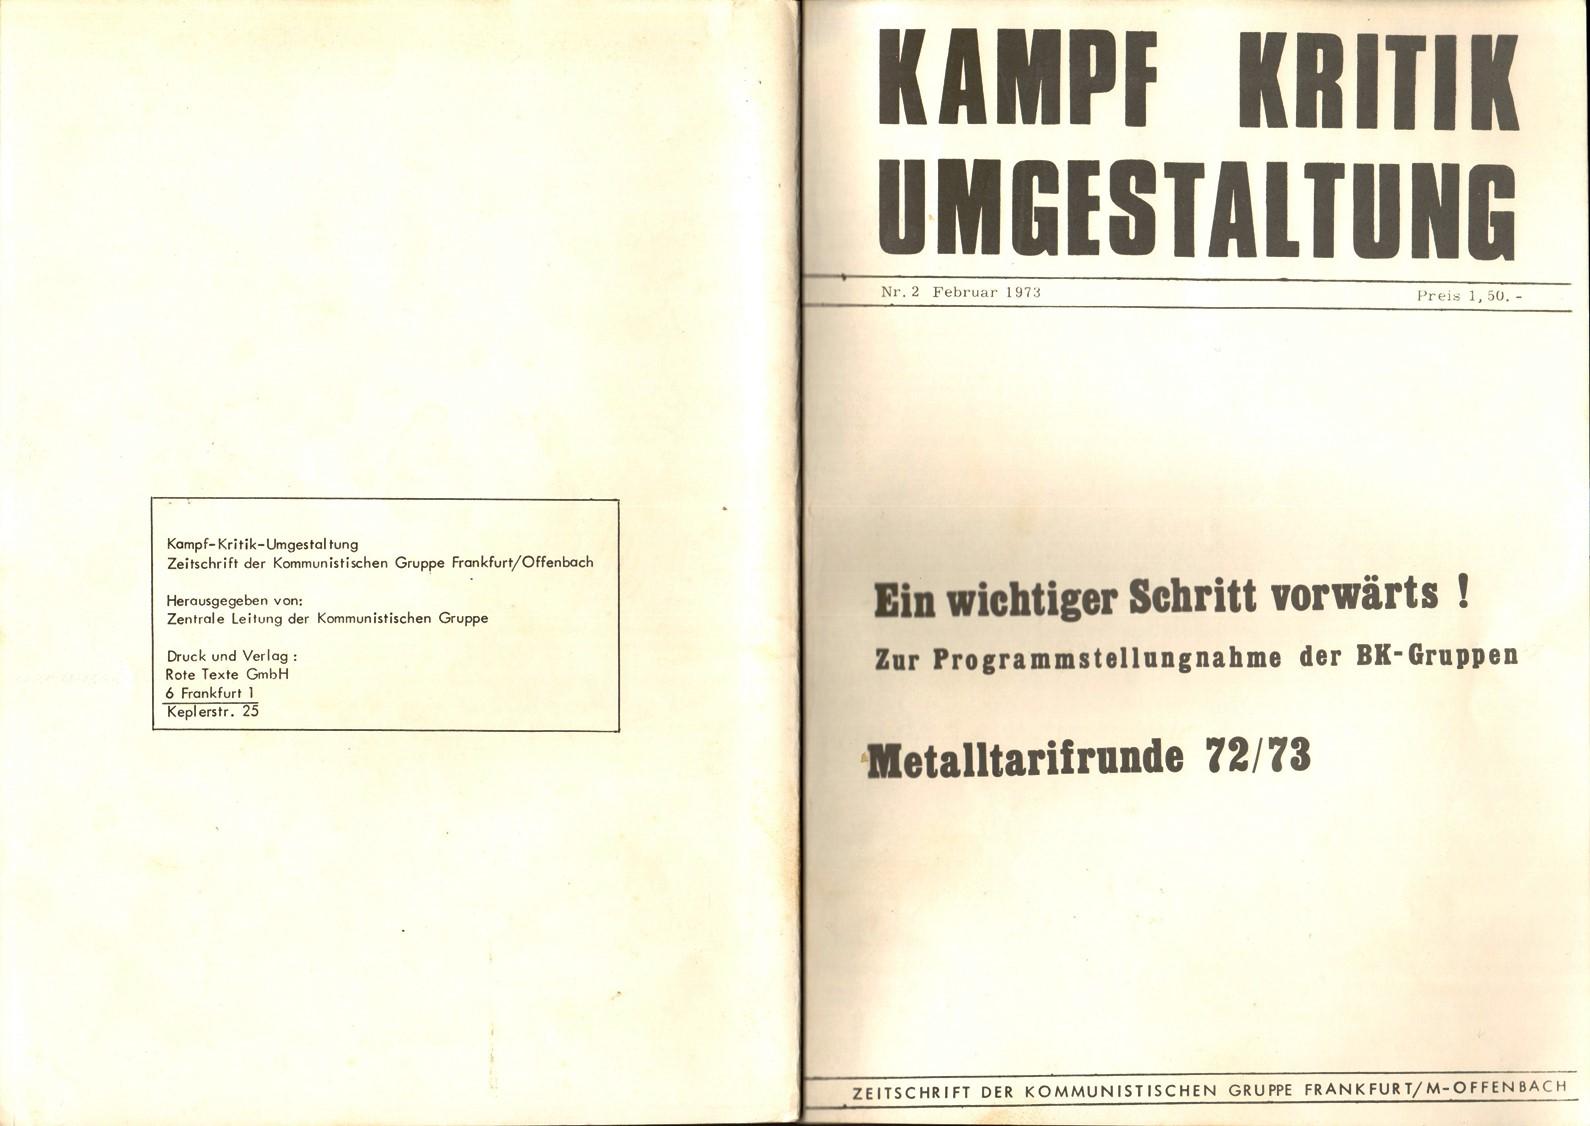 Frankfurt_Offenbach_KG_Kampf_Kritik_Umgestaltung_1973_02_01